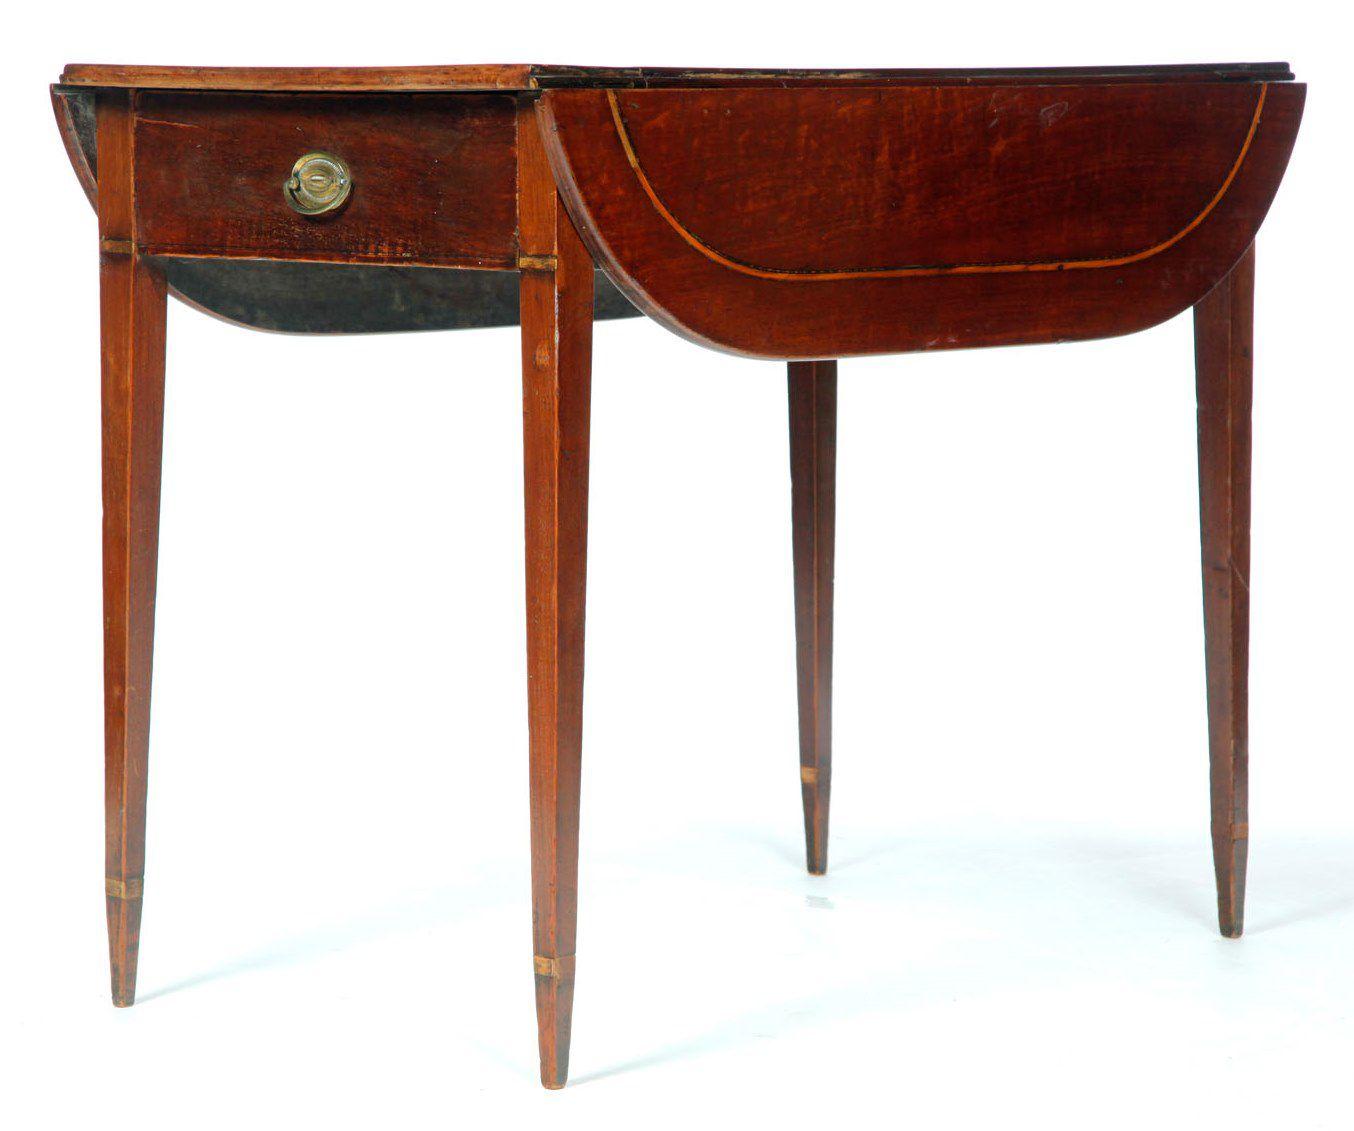 Pembroke Table in George III Style, Mahogany